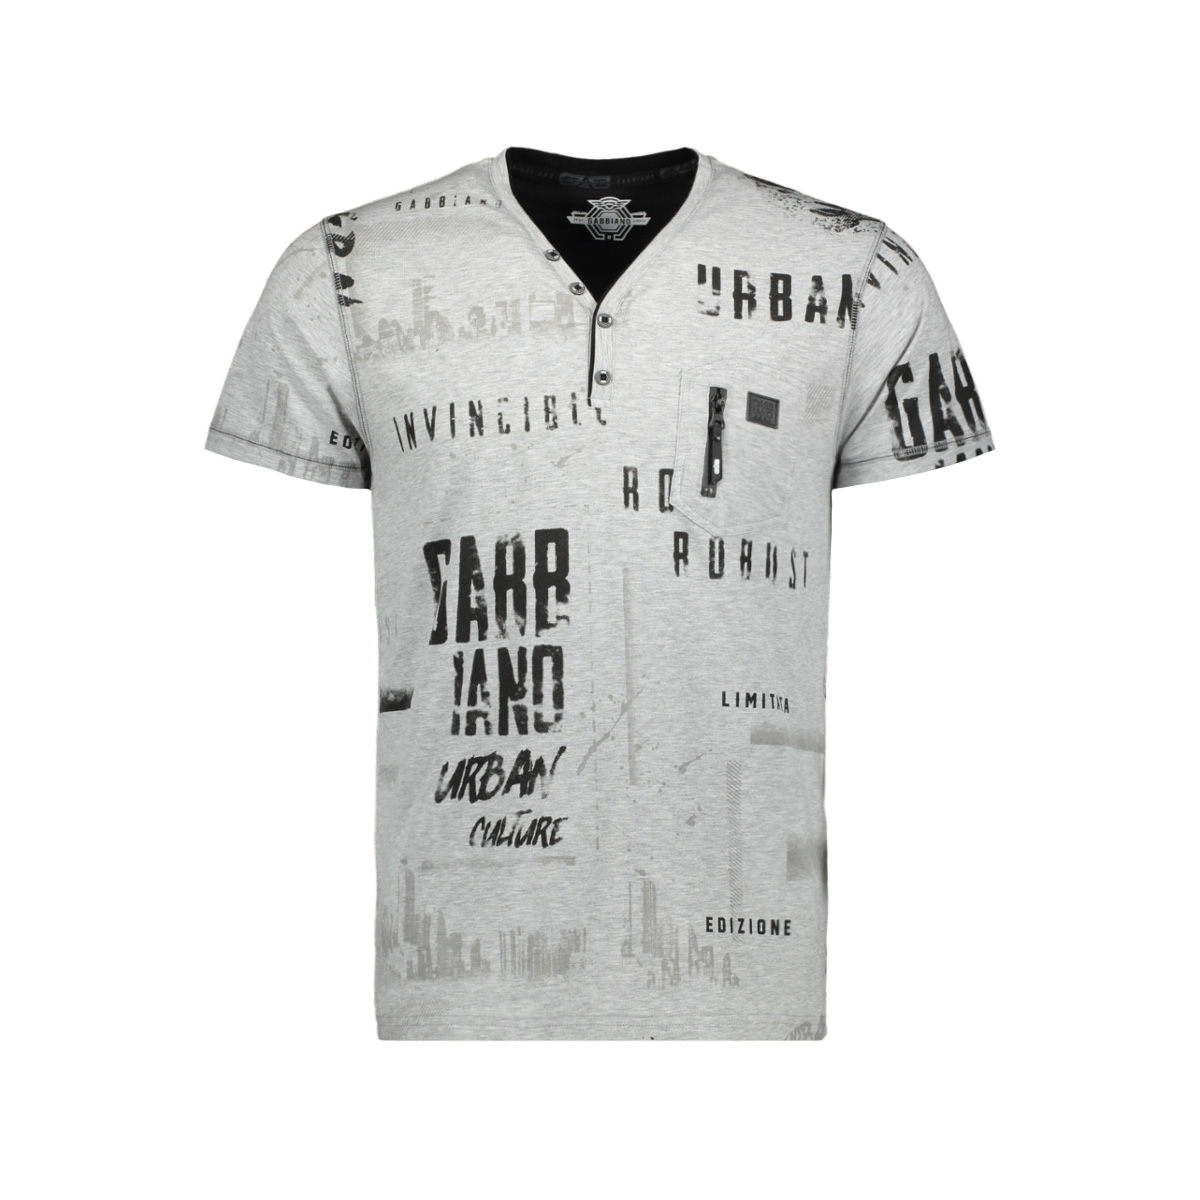 t shirt 13868 gabbiano t-shirt grey